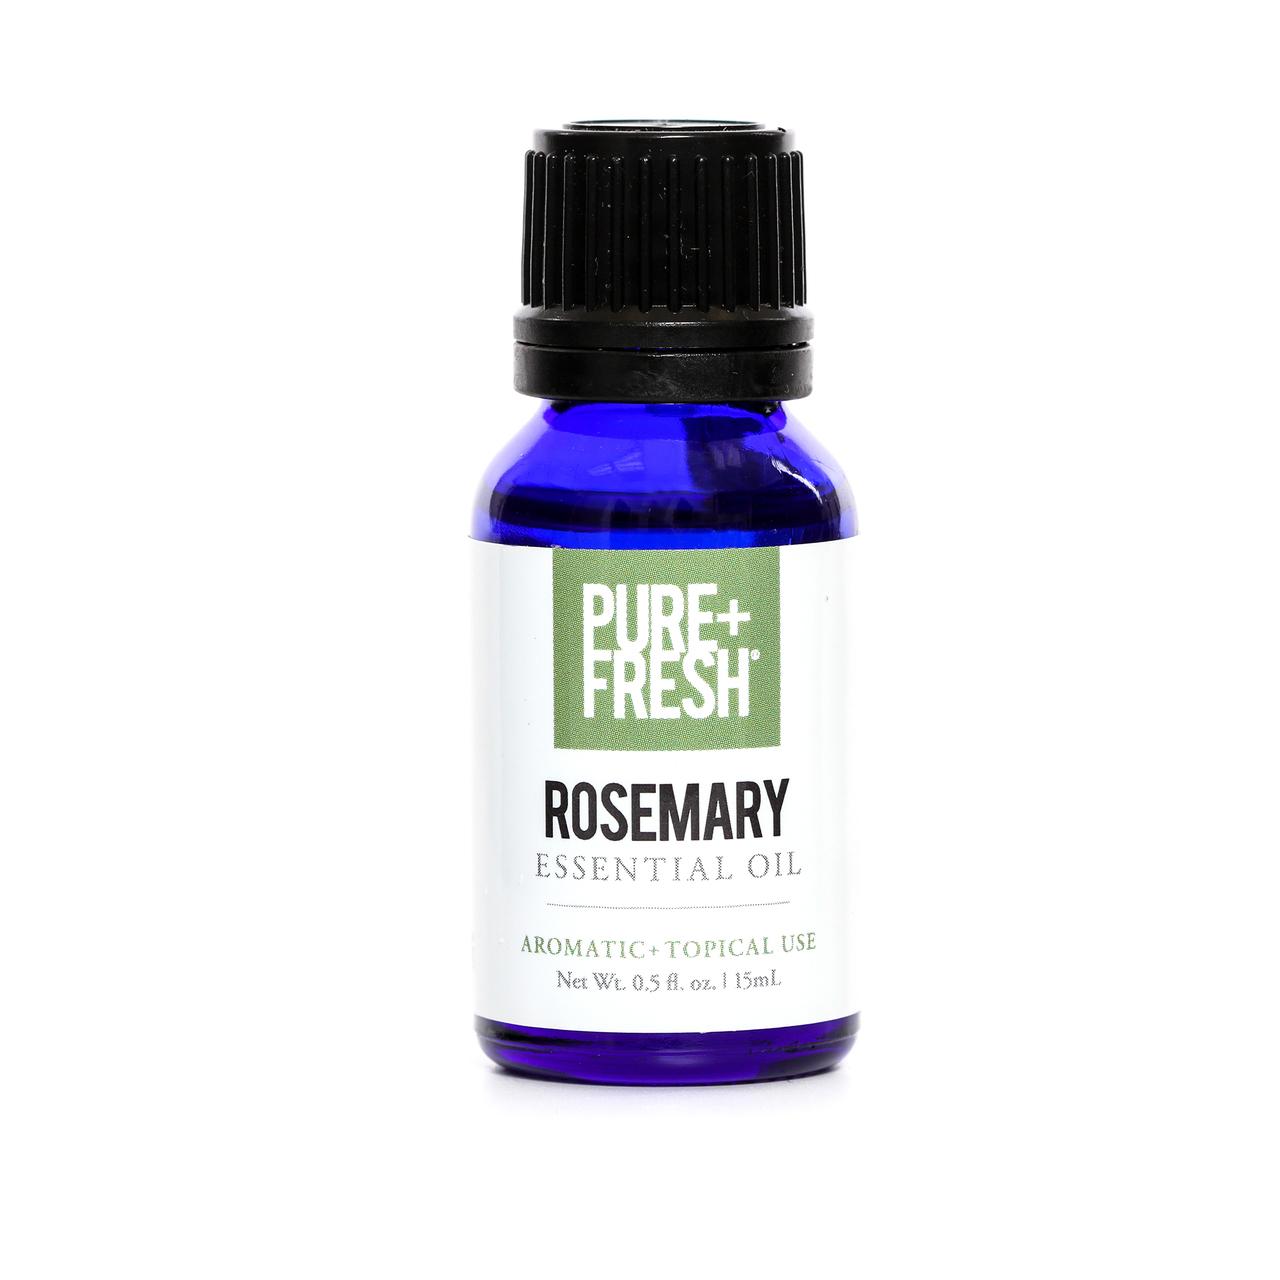 0.5fl oz. Bottle of Pure+Fresh Rosemary Essential Oil